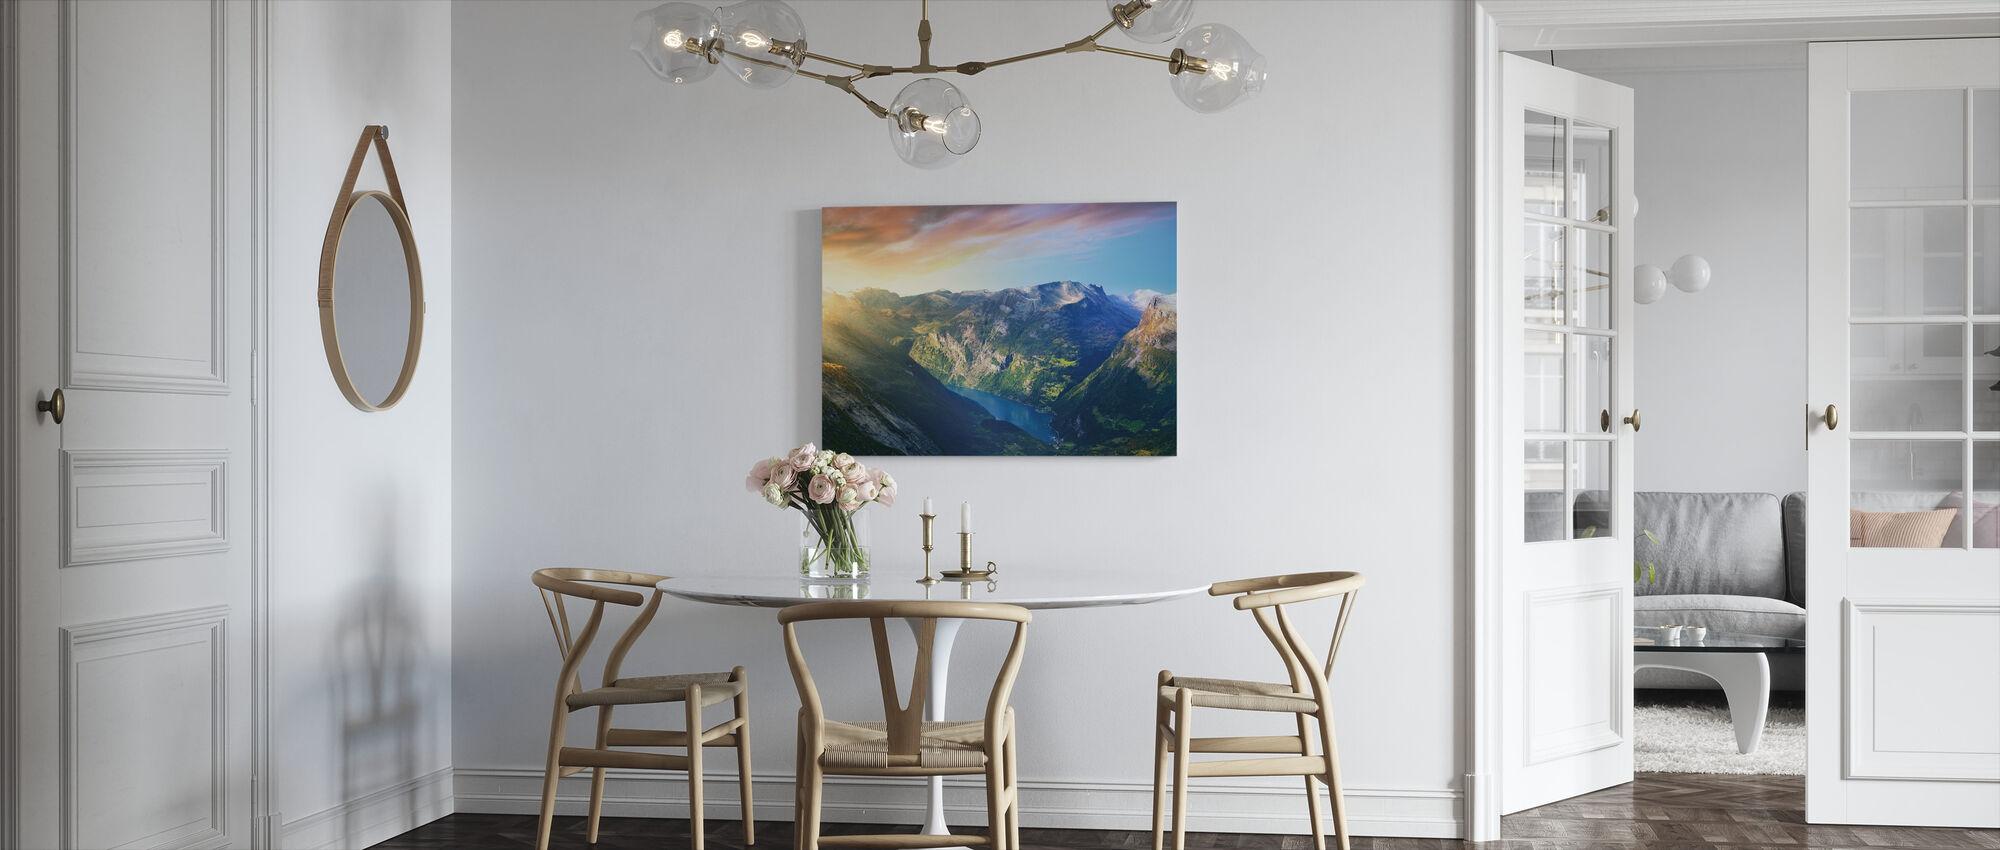 Sunrise over Geirangerfjord, Norway - Canvas print - Kitchen